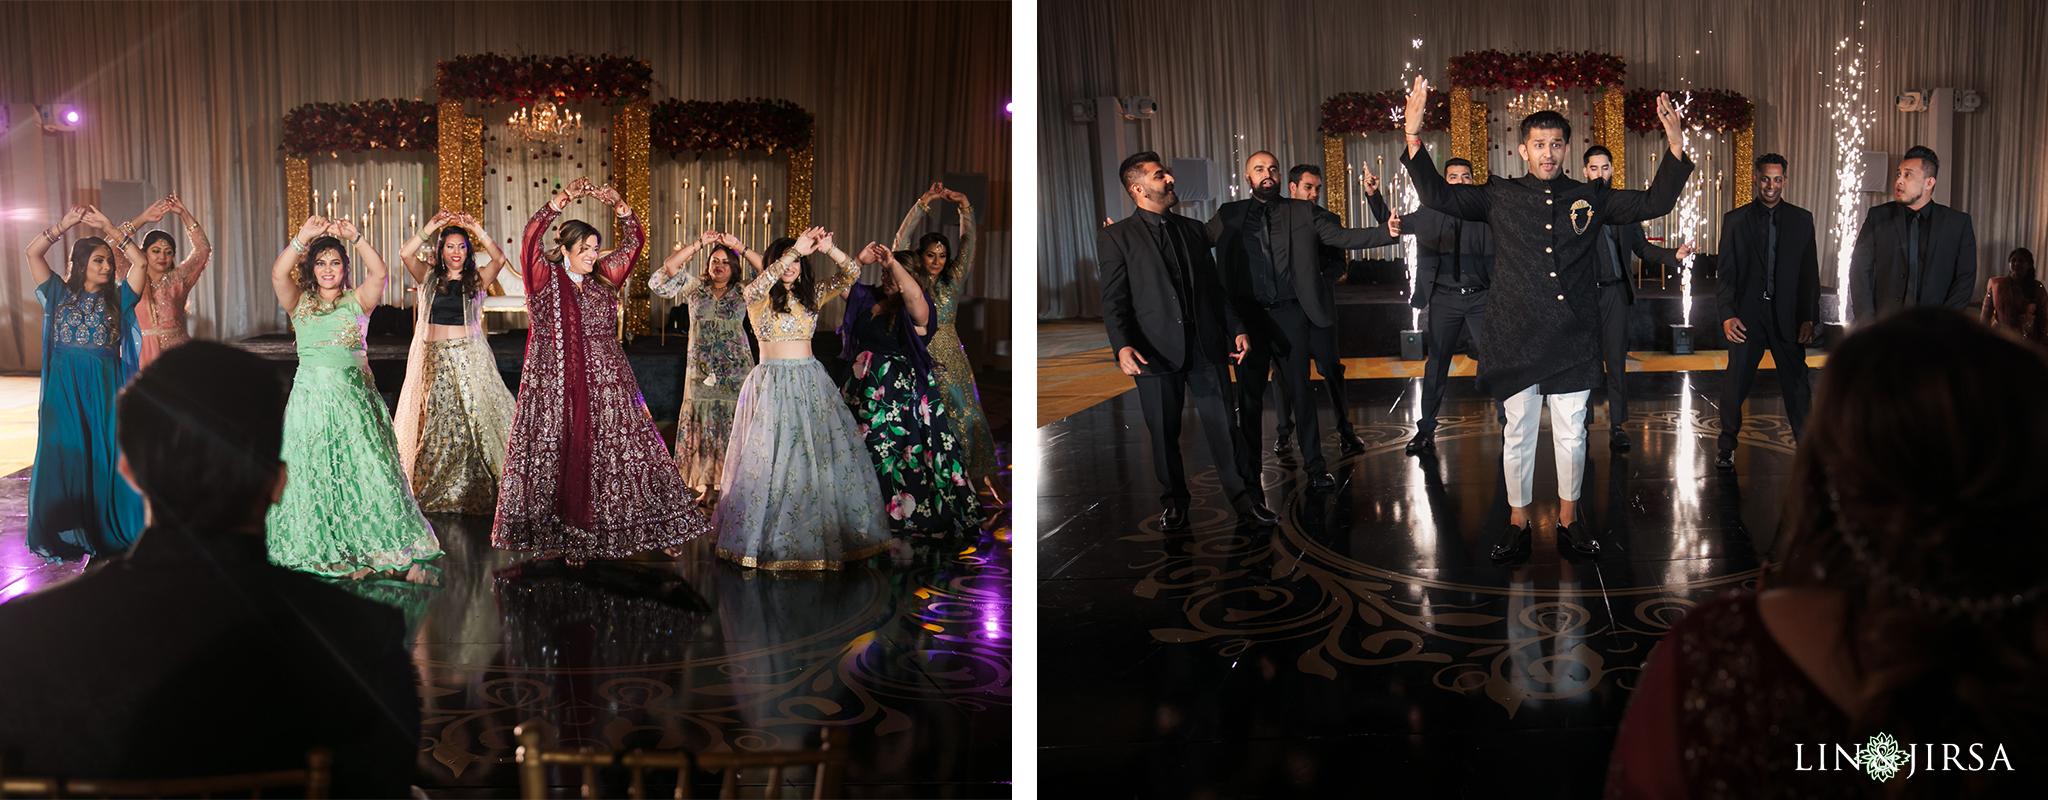 46 Hyatt Regency Orange County Indian Wedding Photography